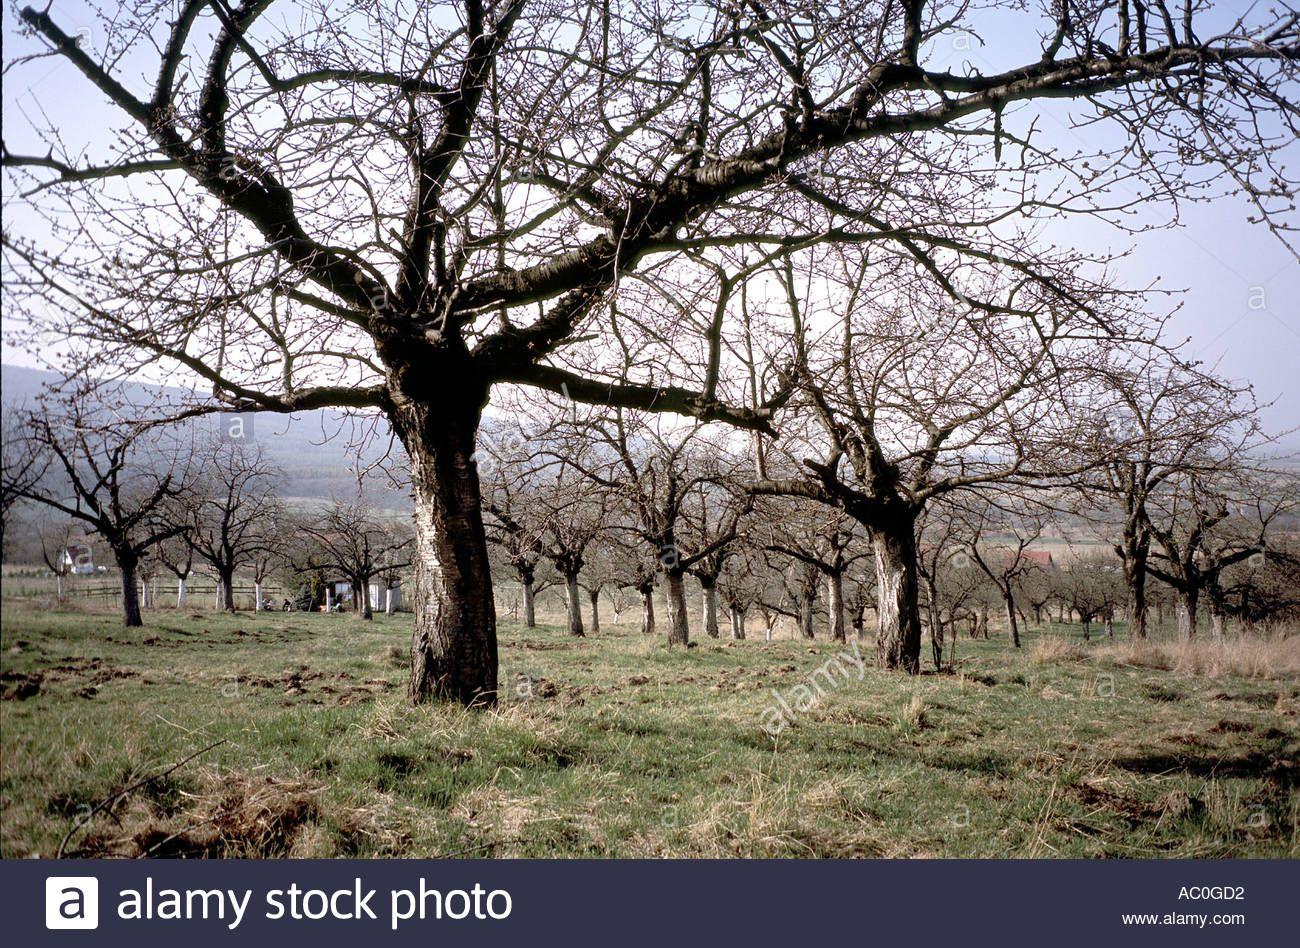 Old Cherry trees in winter Prunus avium Stock Photo, Royalty Free ...